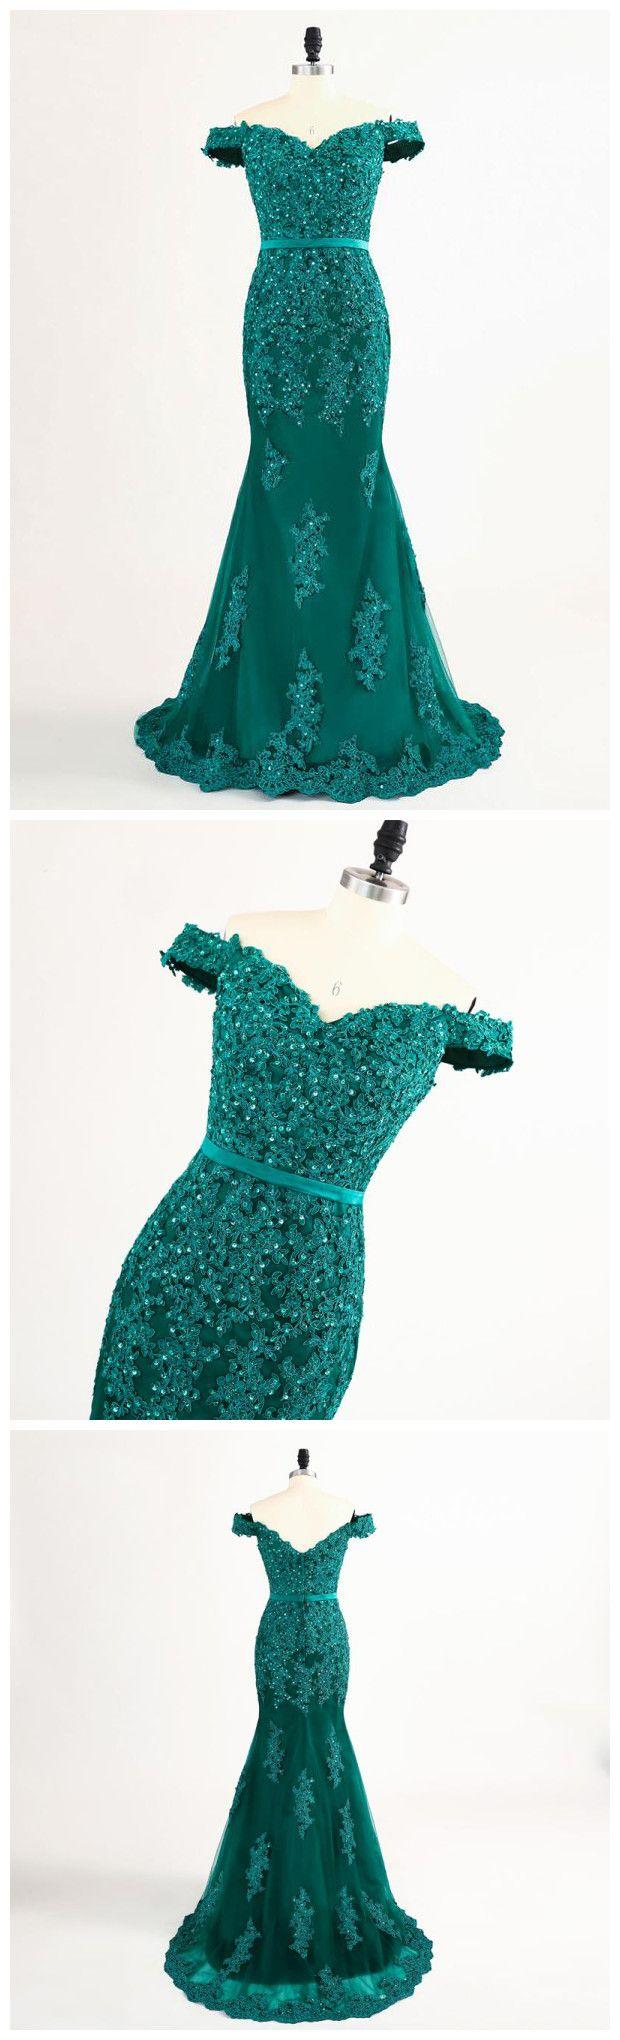 Prom dresses longprom dresses mermaidprom dresses greenbeautiful